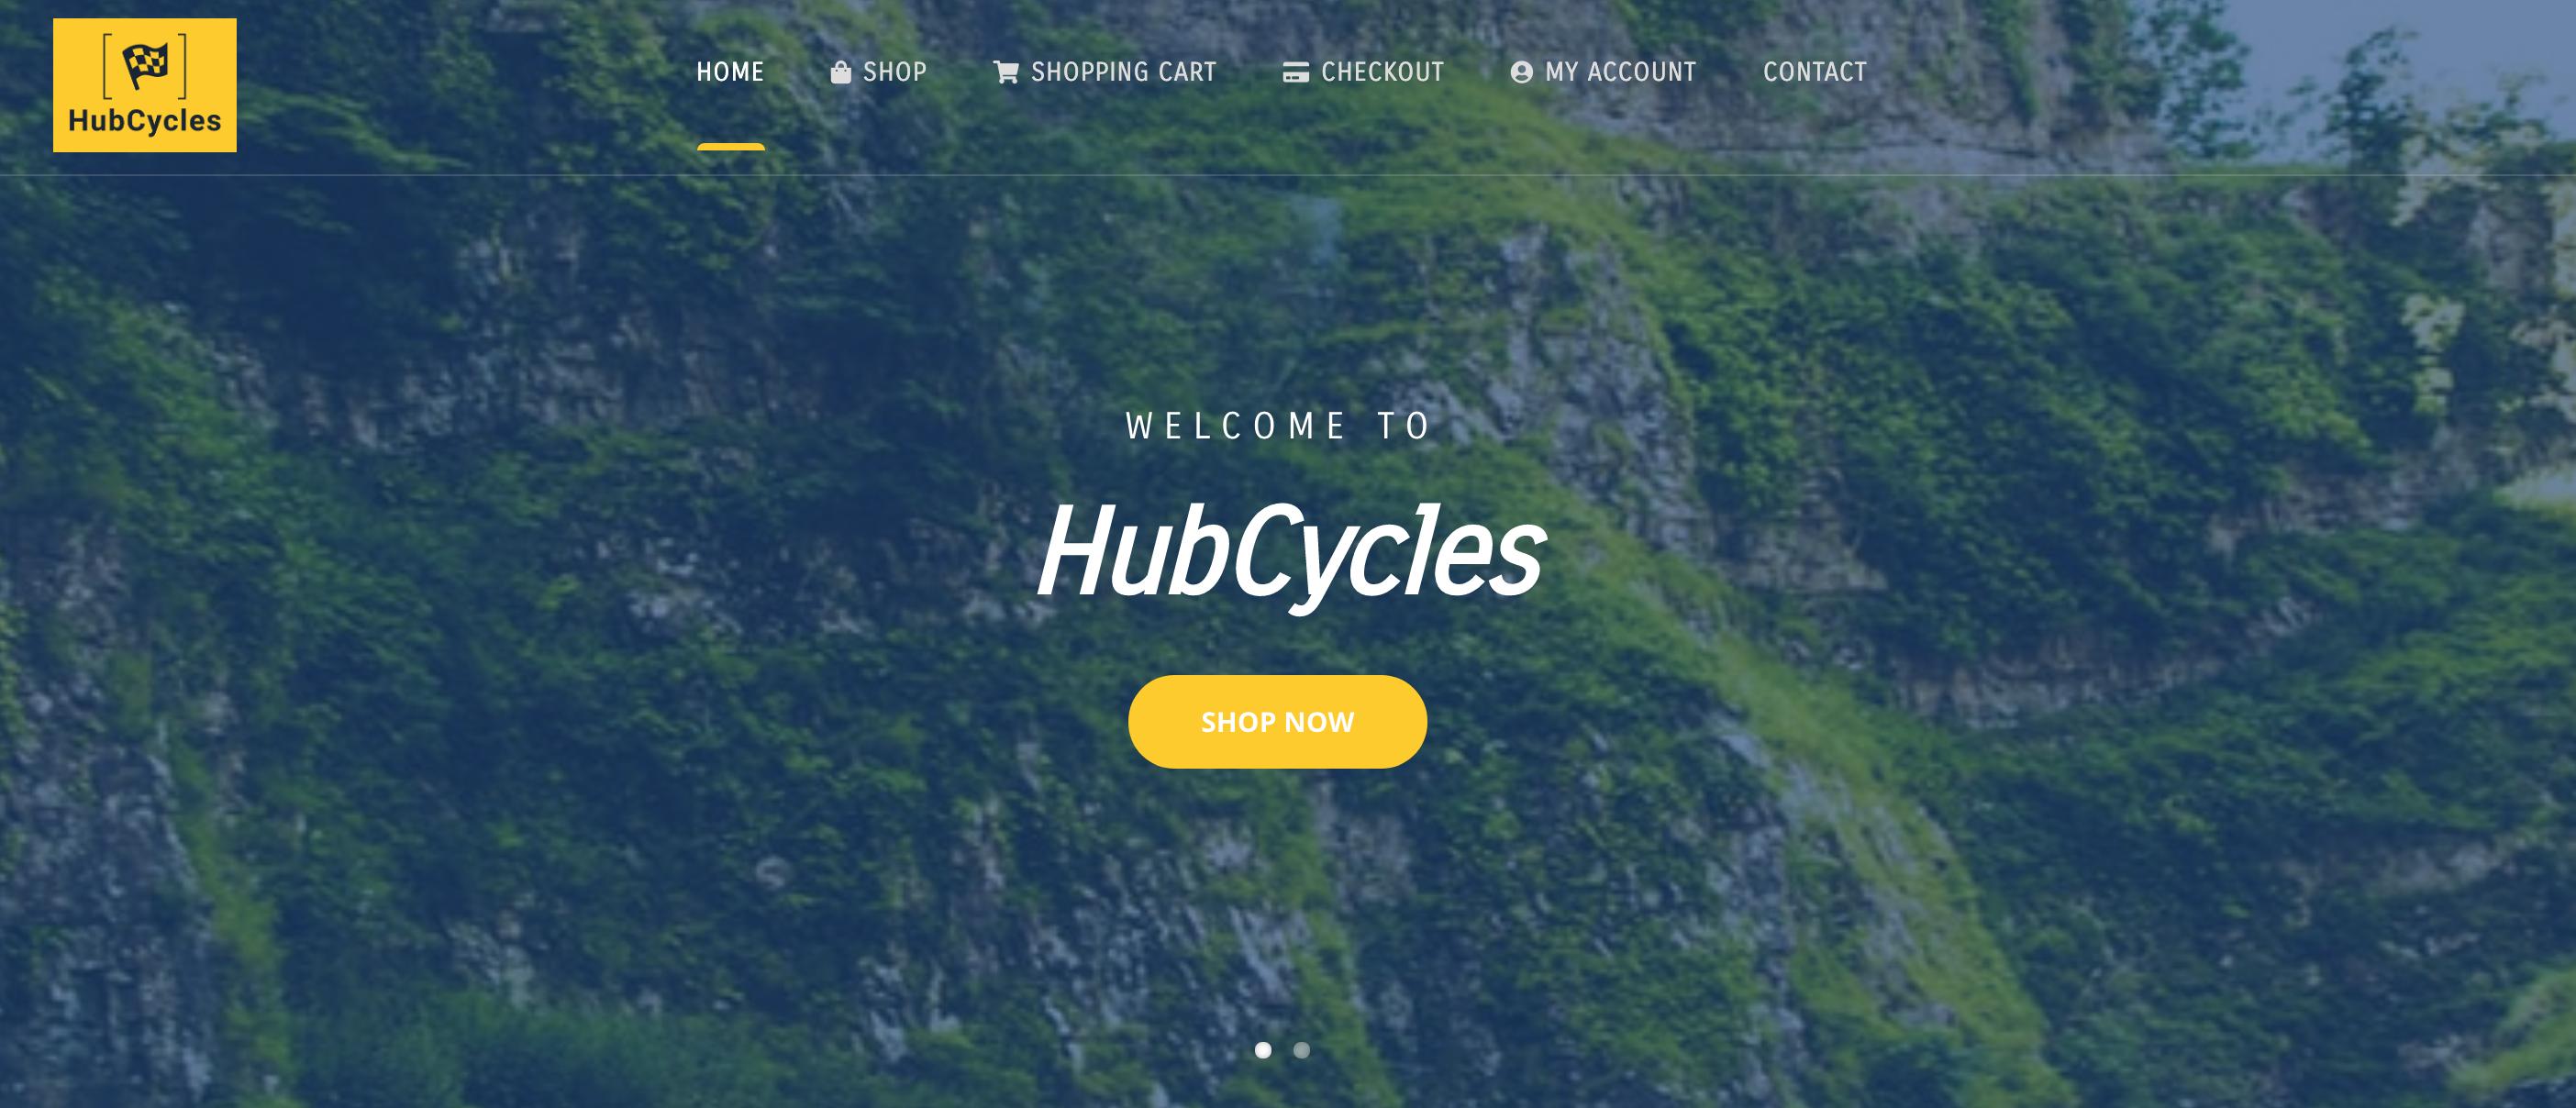 Hub Cycles